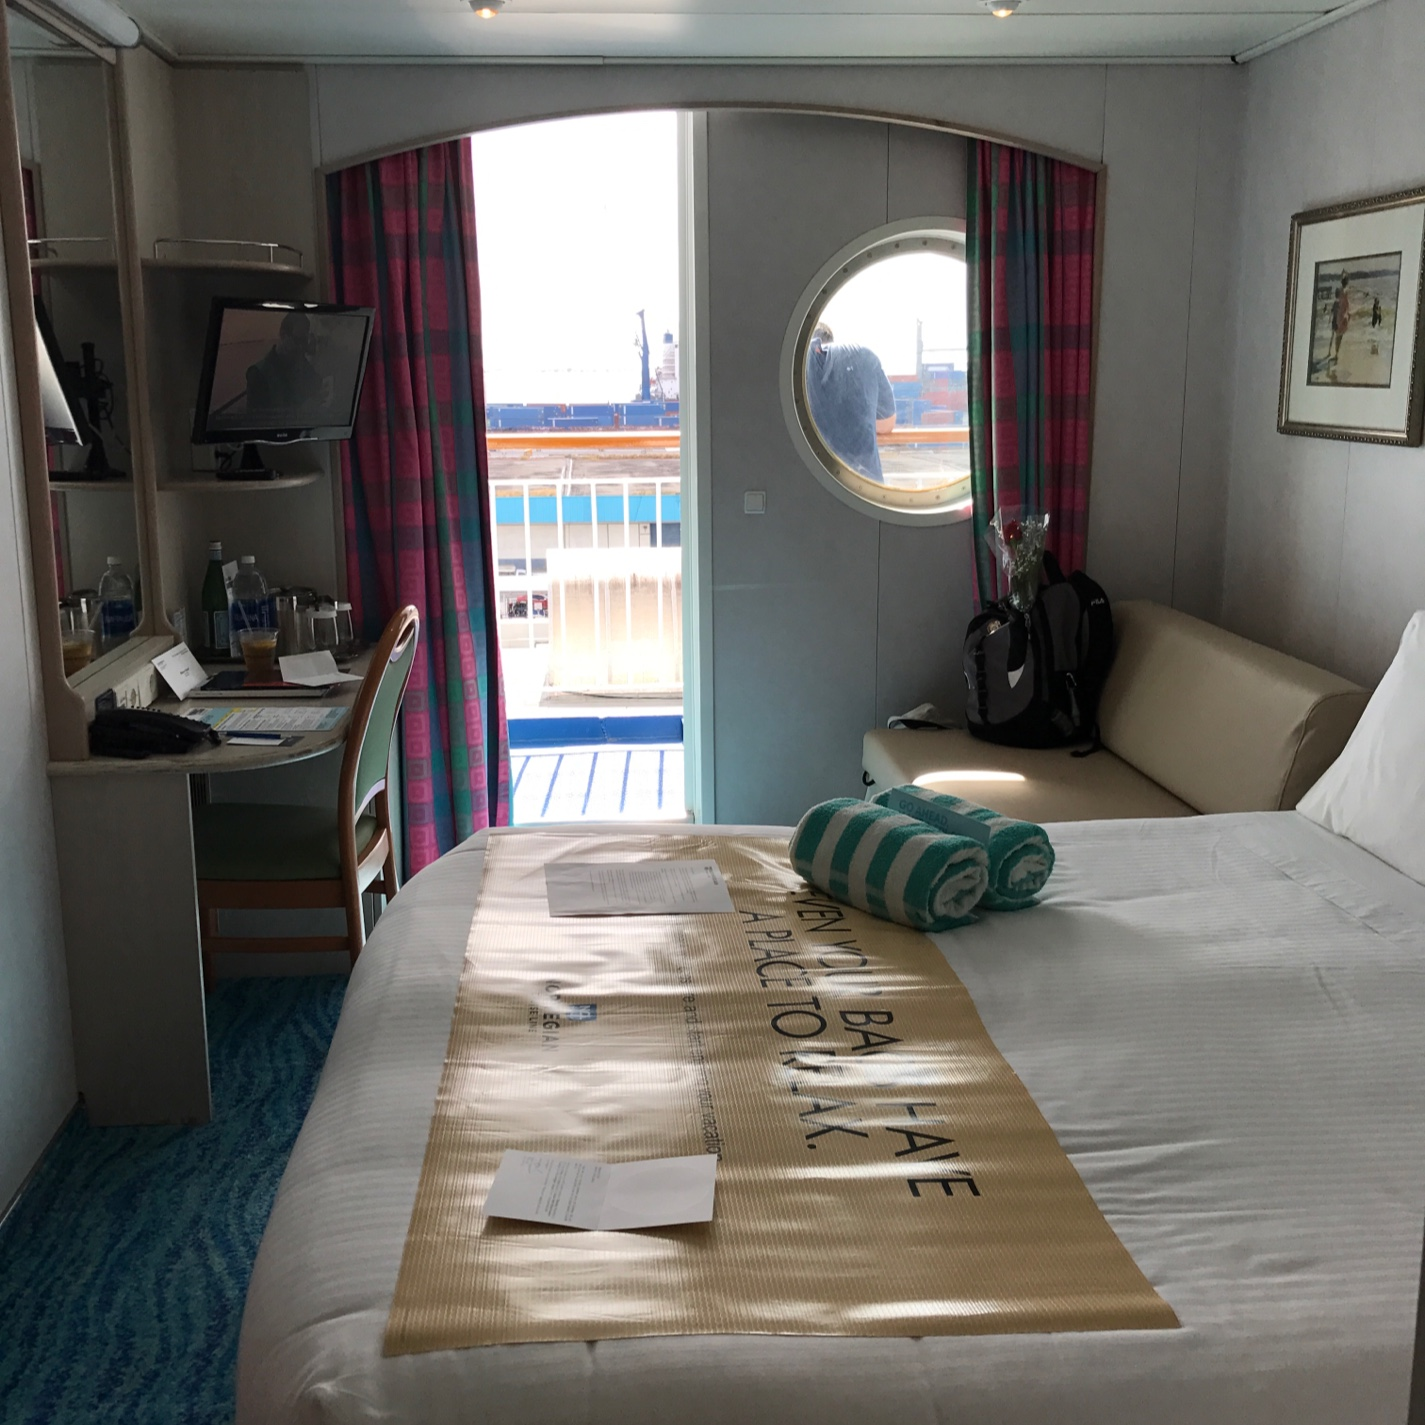 Norwegian Sky Cruise Ship Reviews And Photos